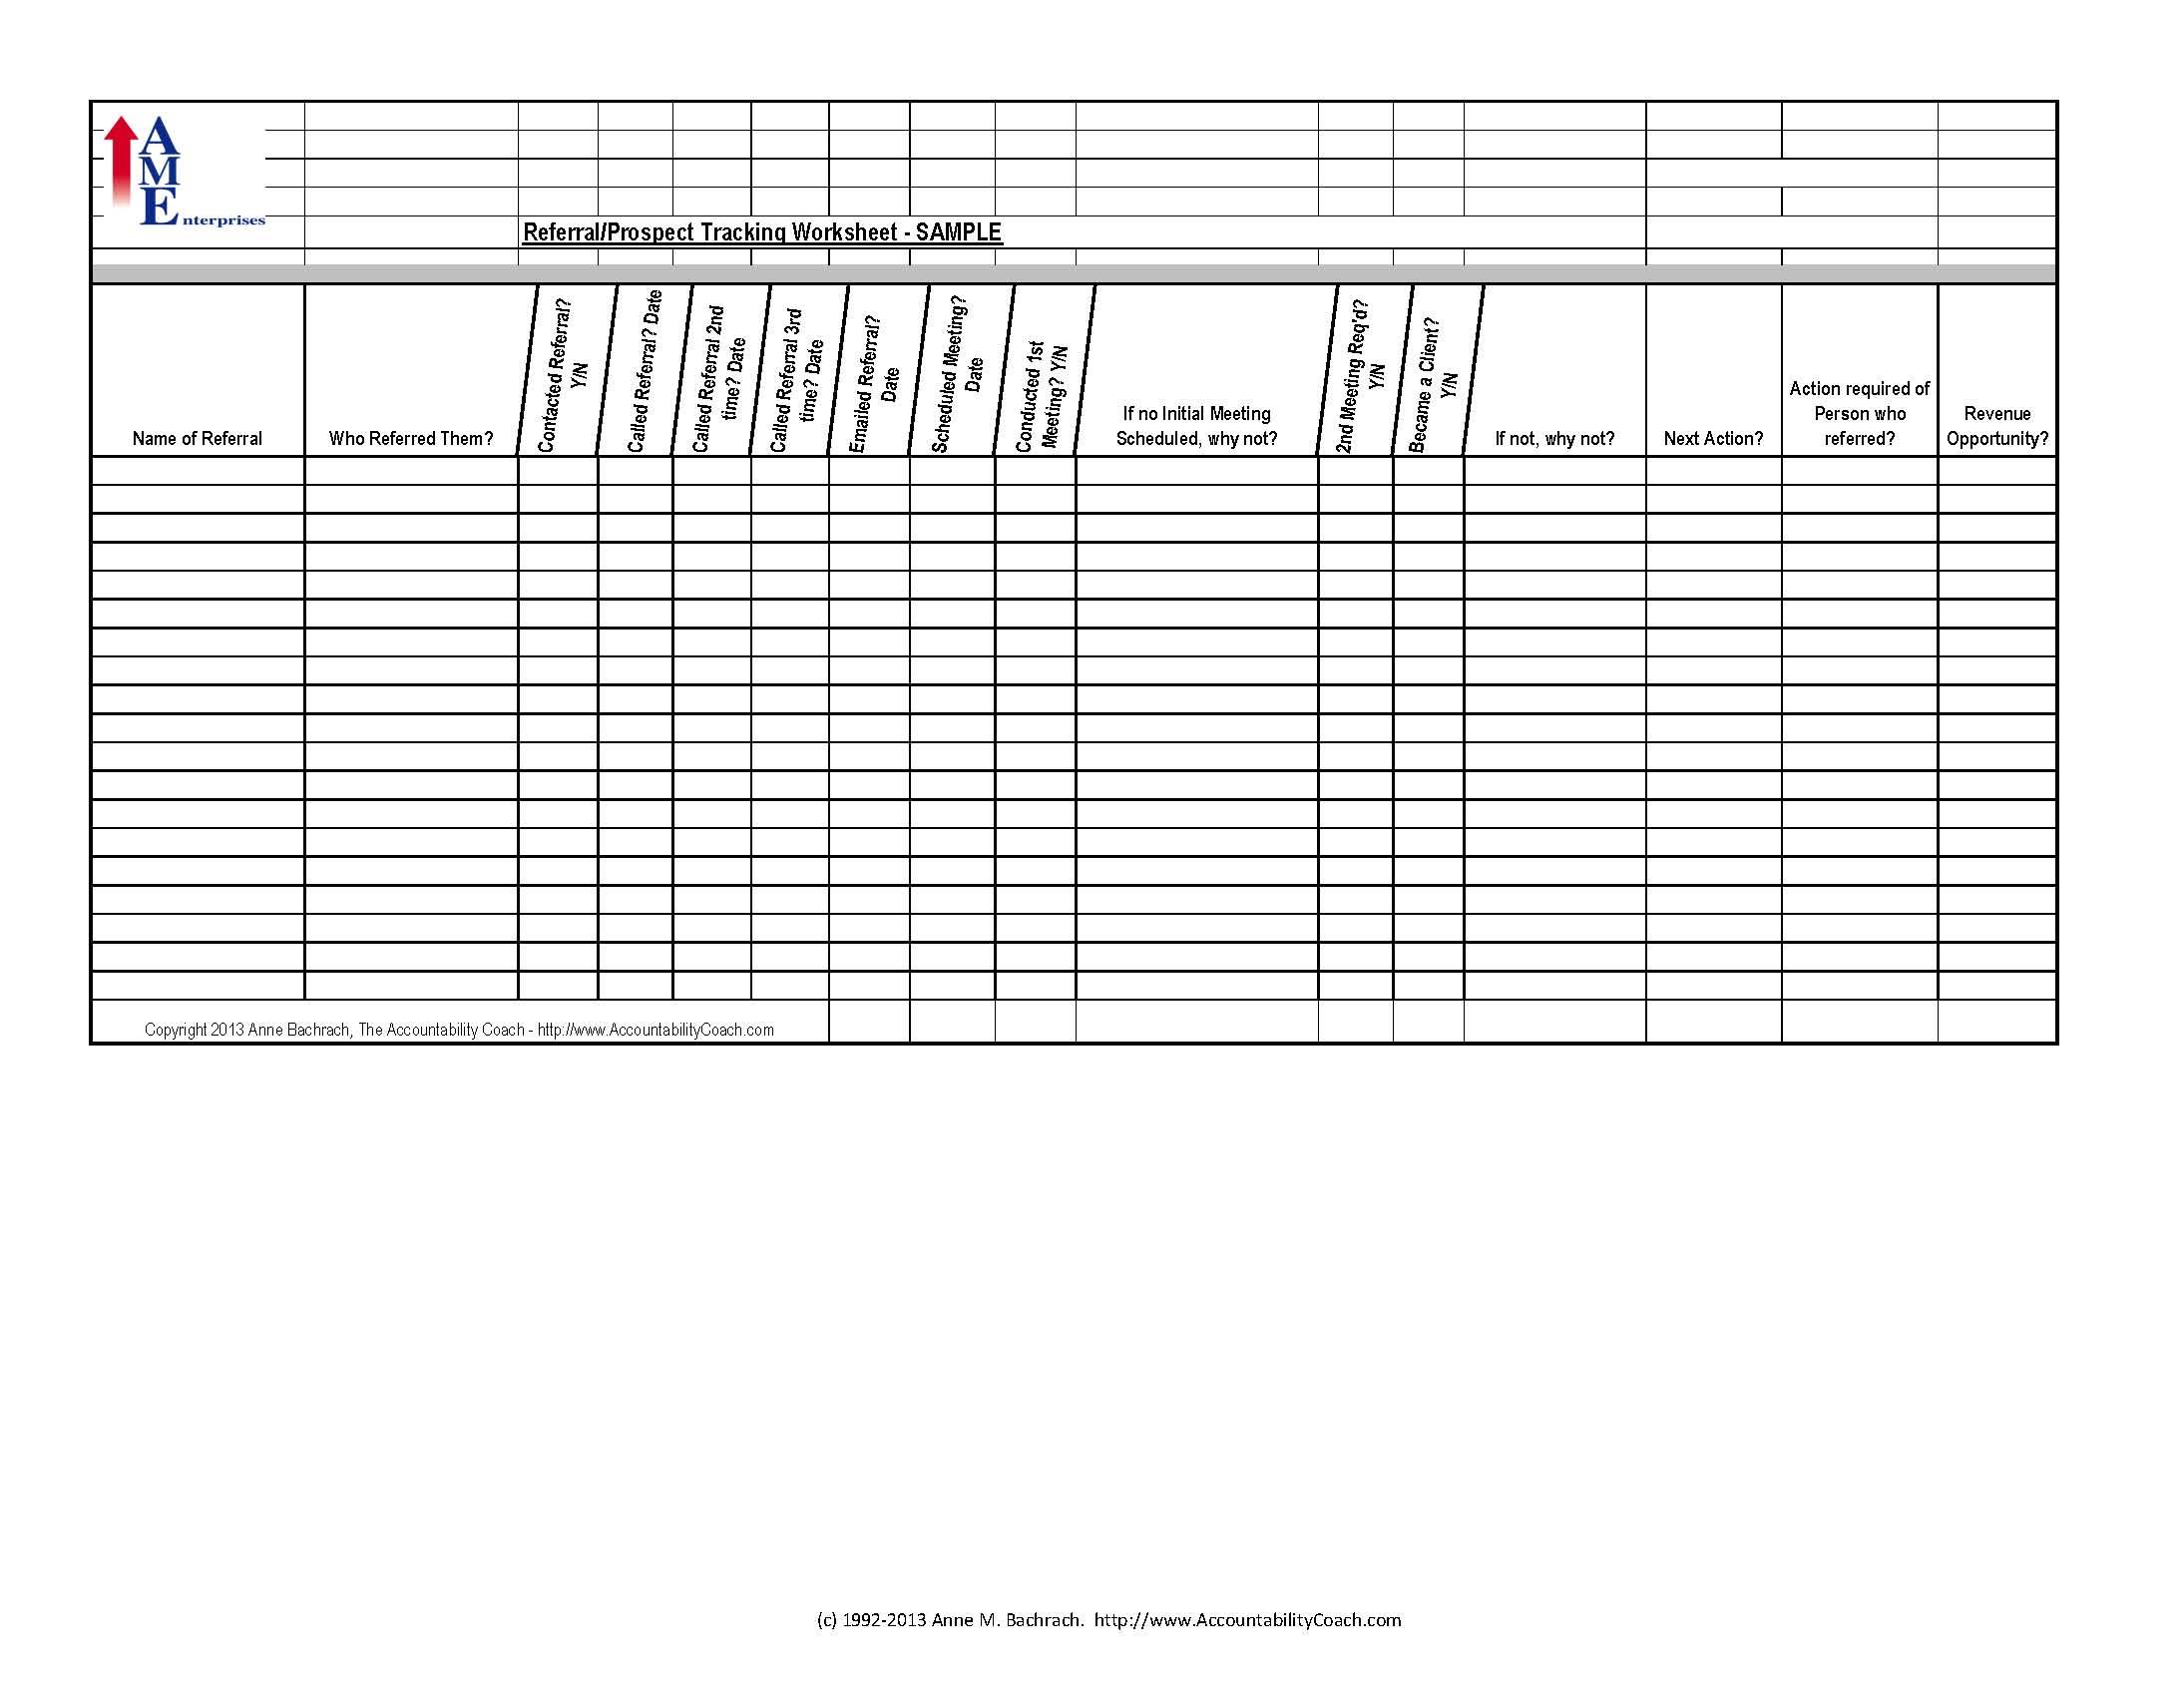 Spreadsheet Samples Free With Regard To Referral/prospect Tracking Spreadsheet – Sample – Free Download